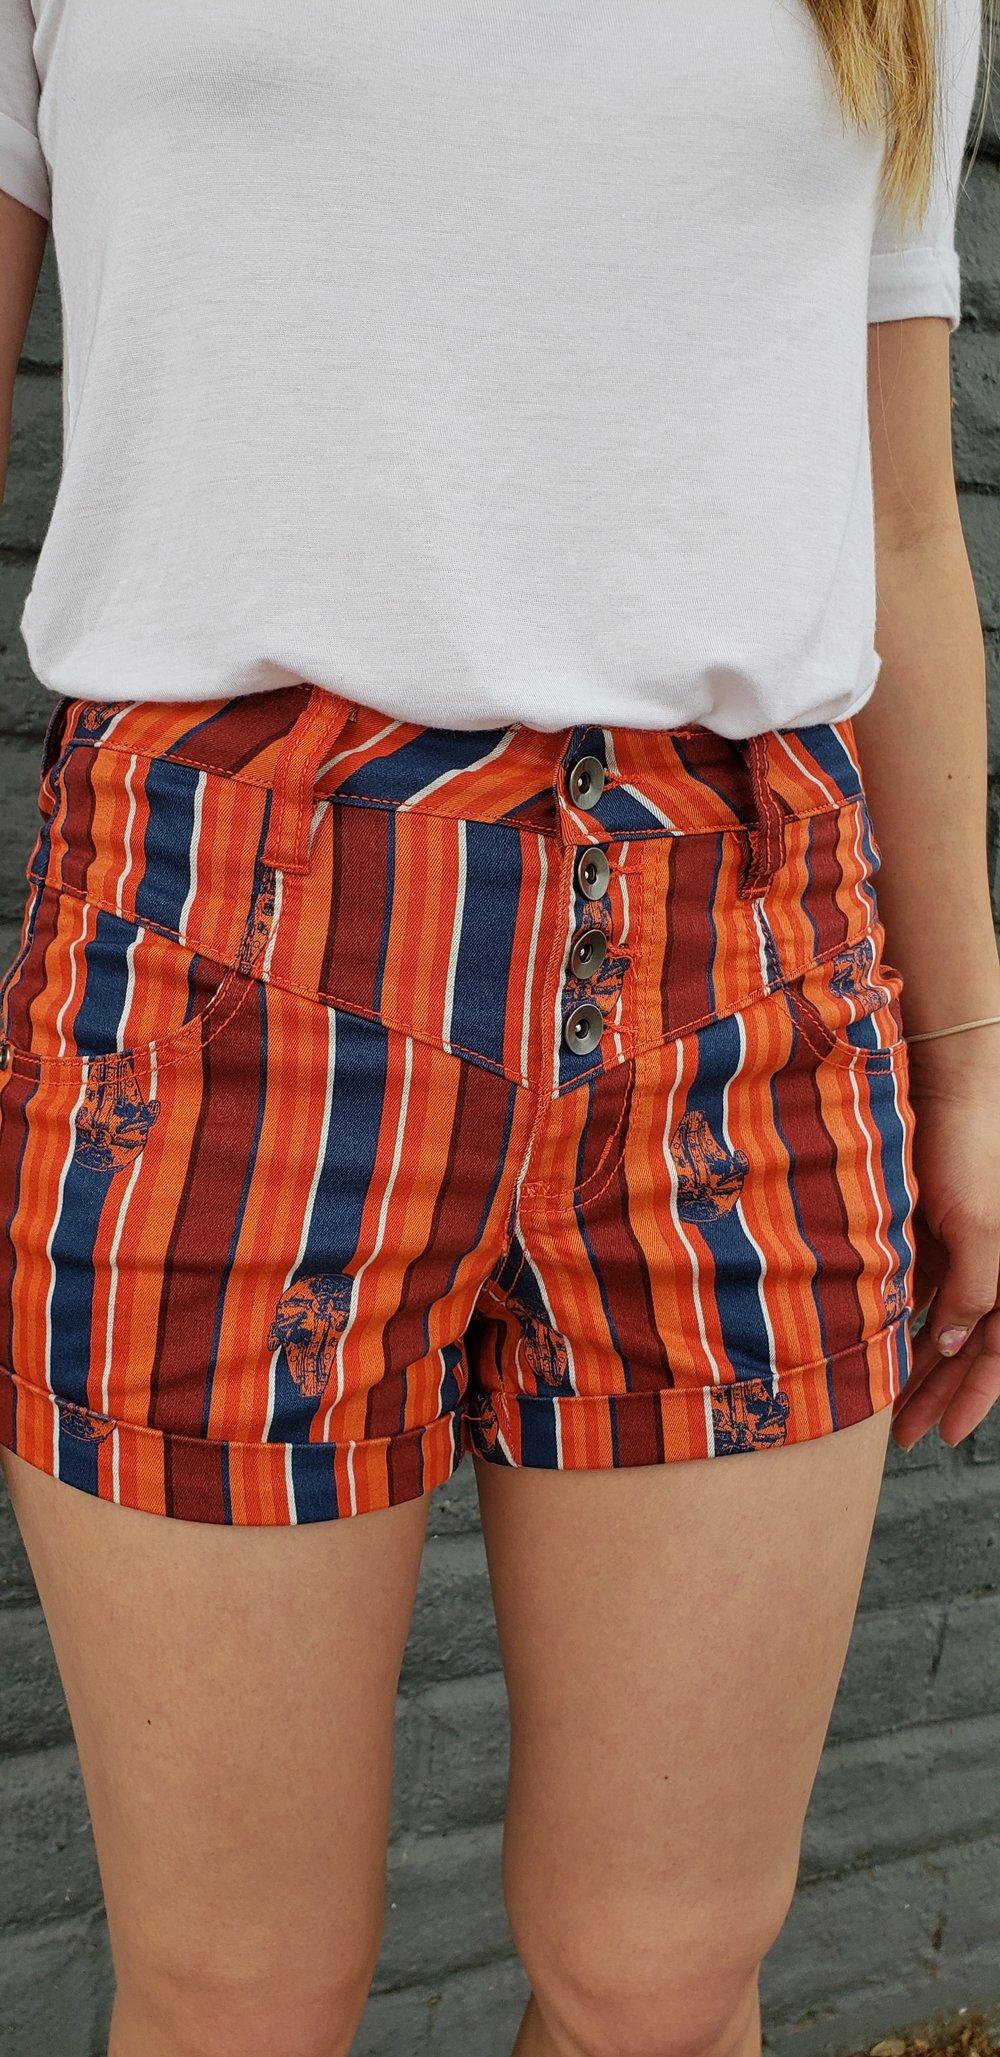 Solo Shorts 7.jpg